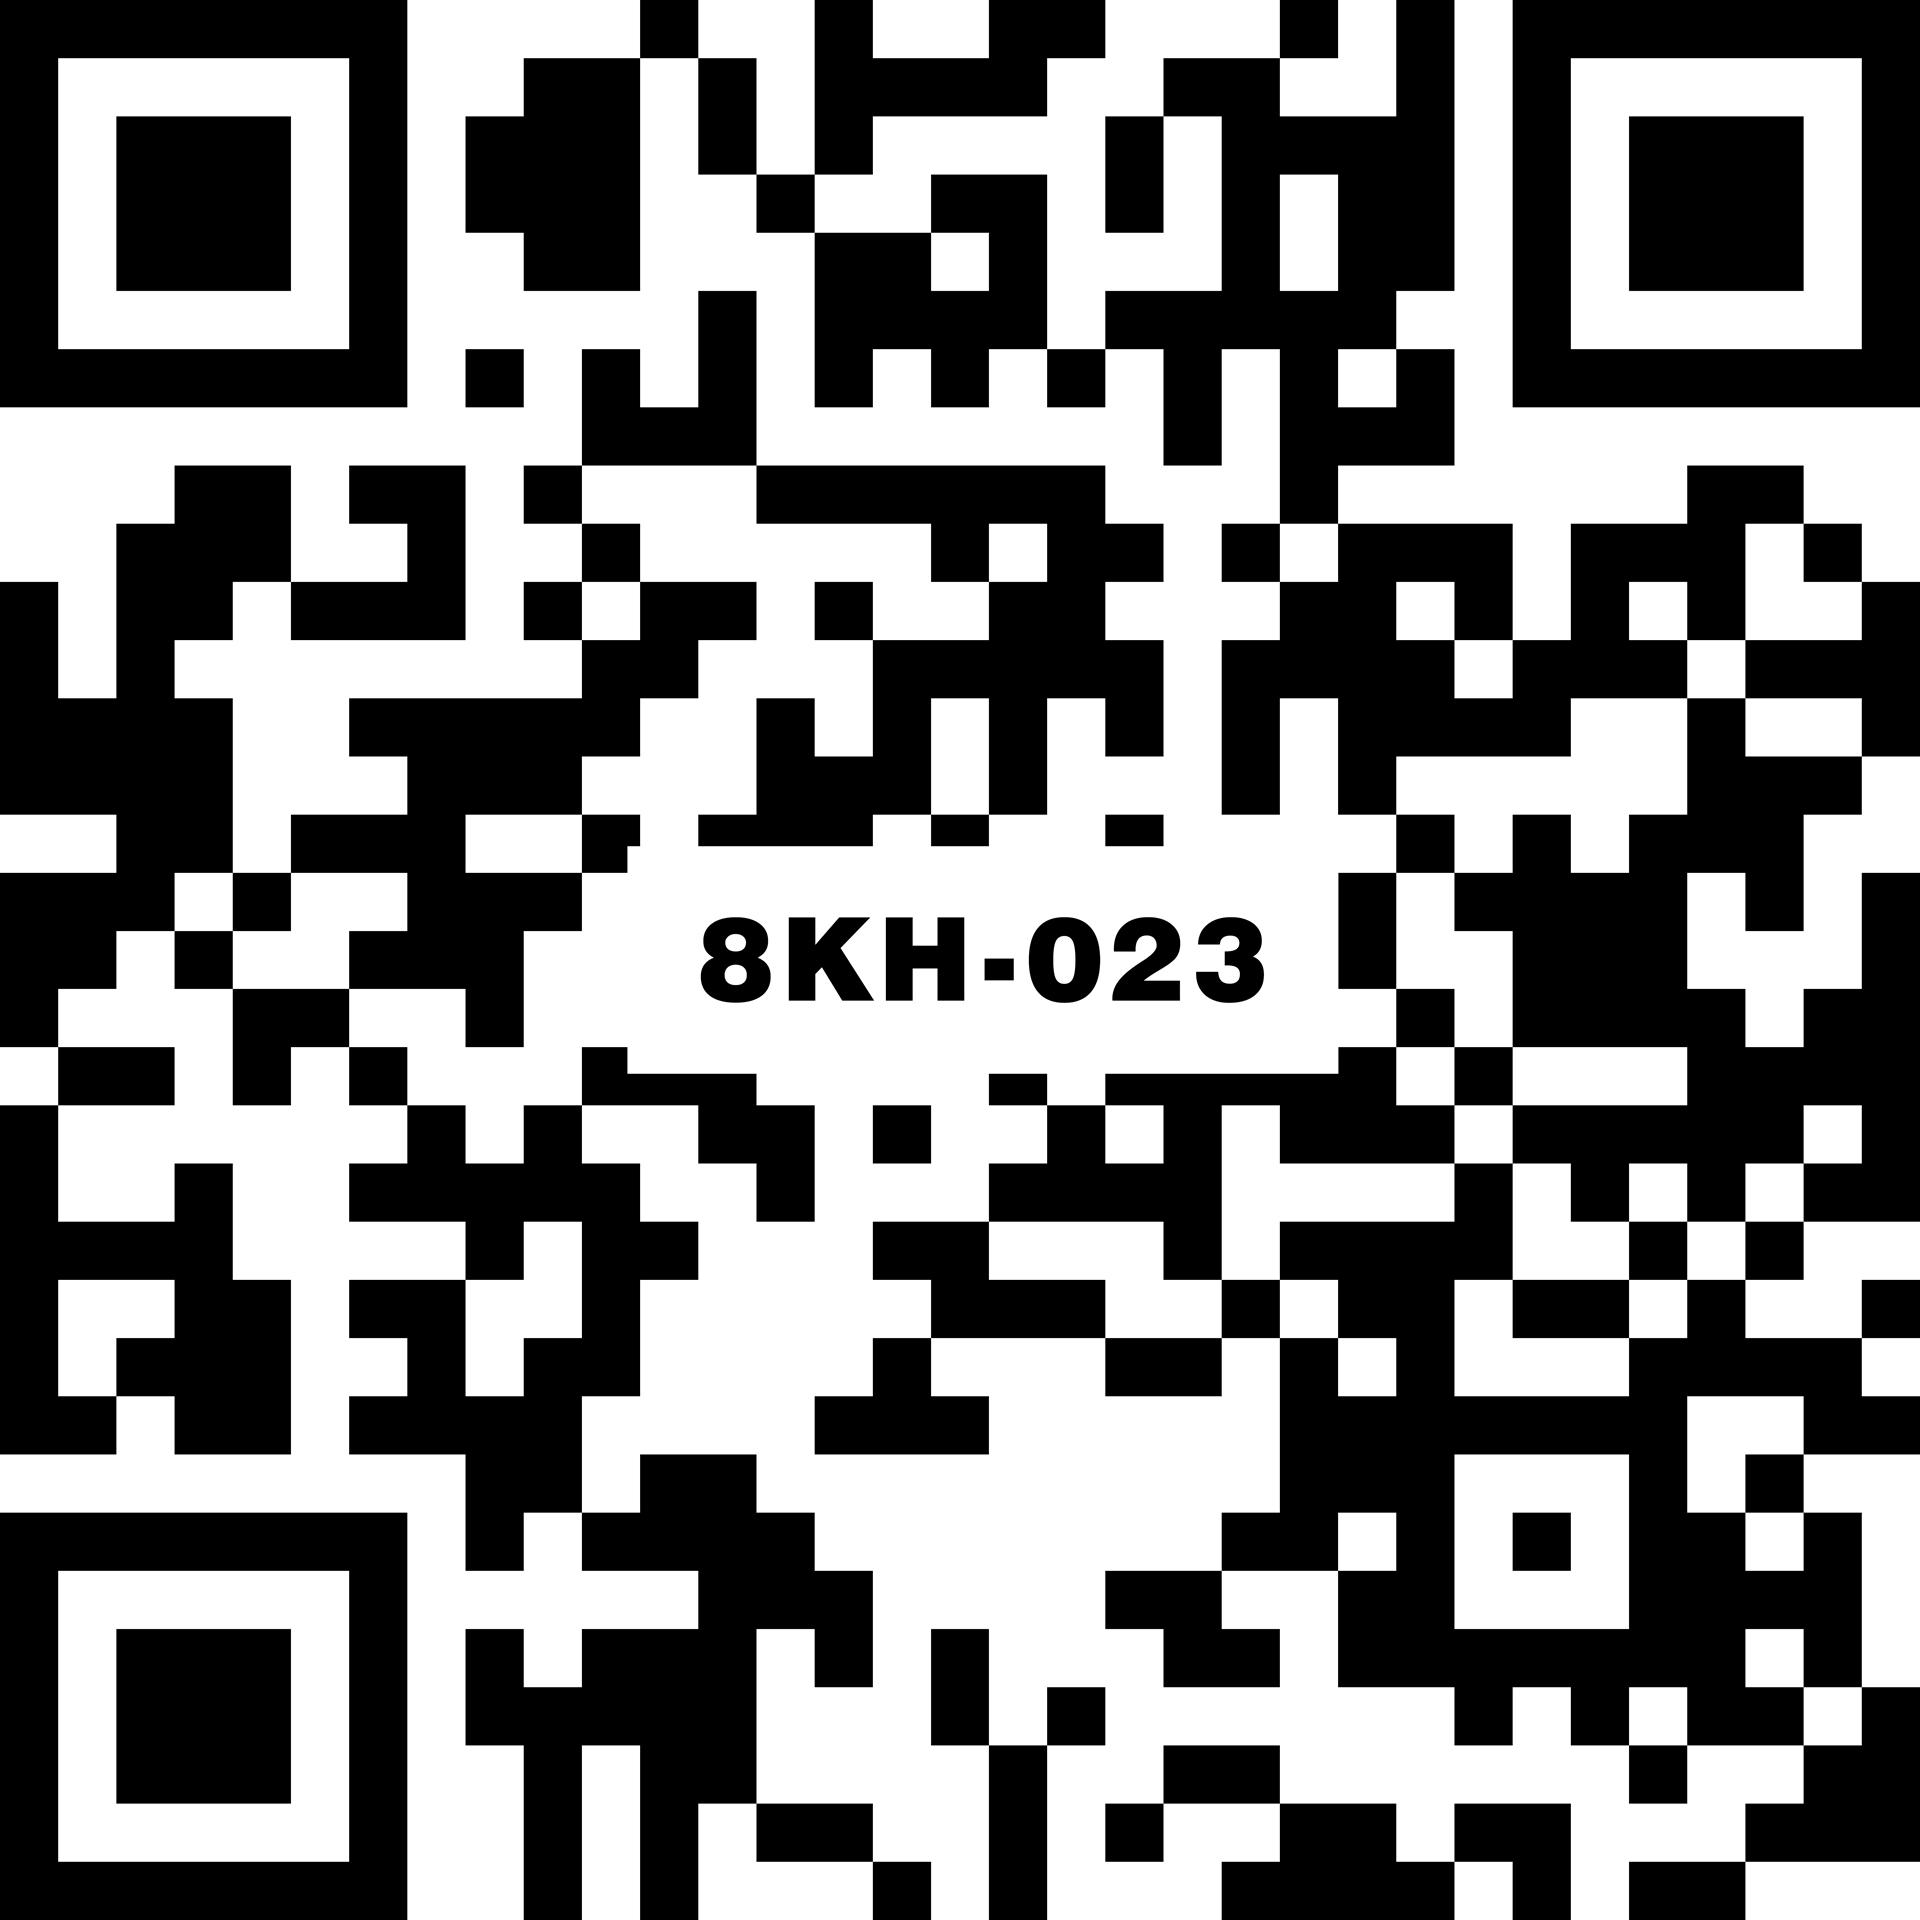 8KH-023